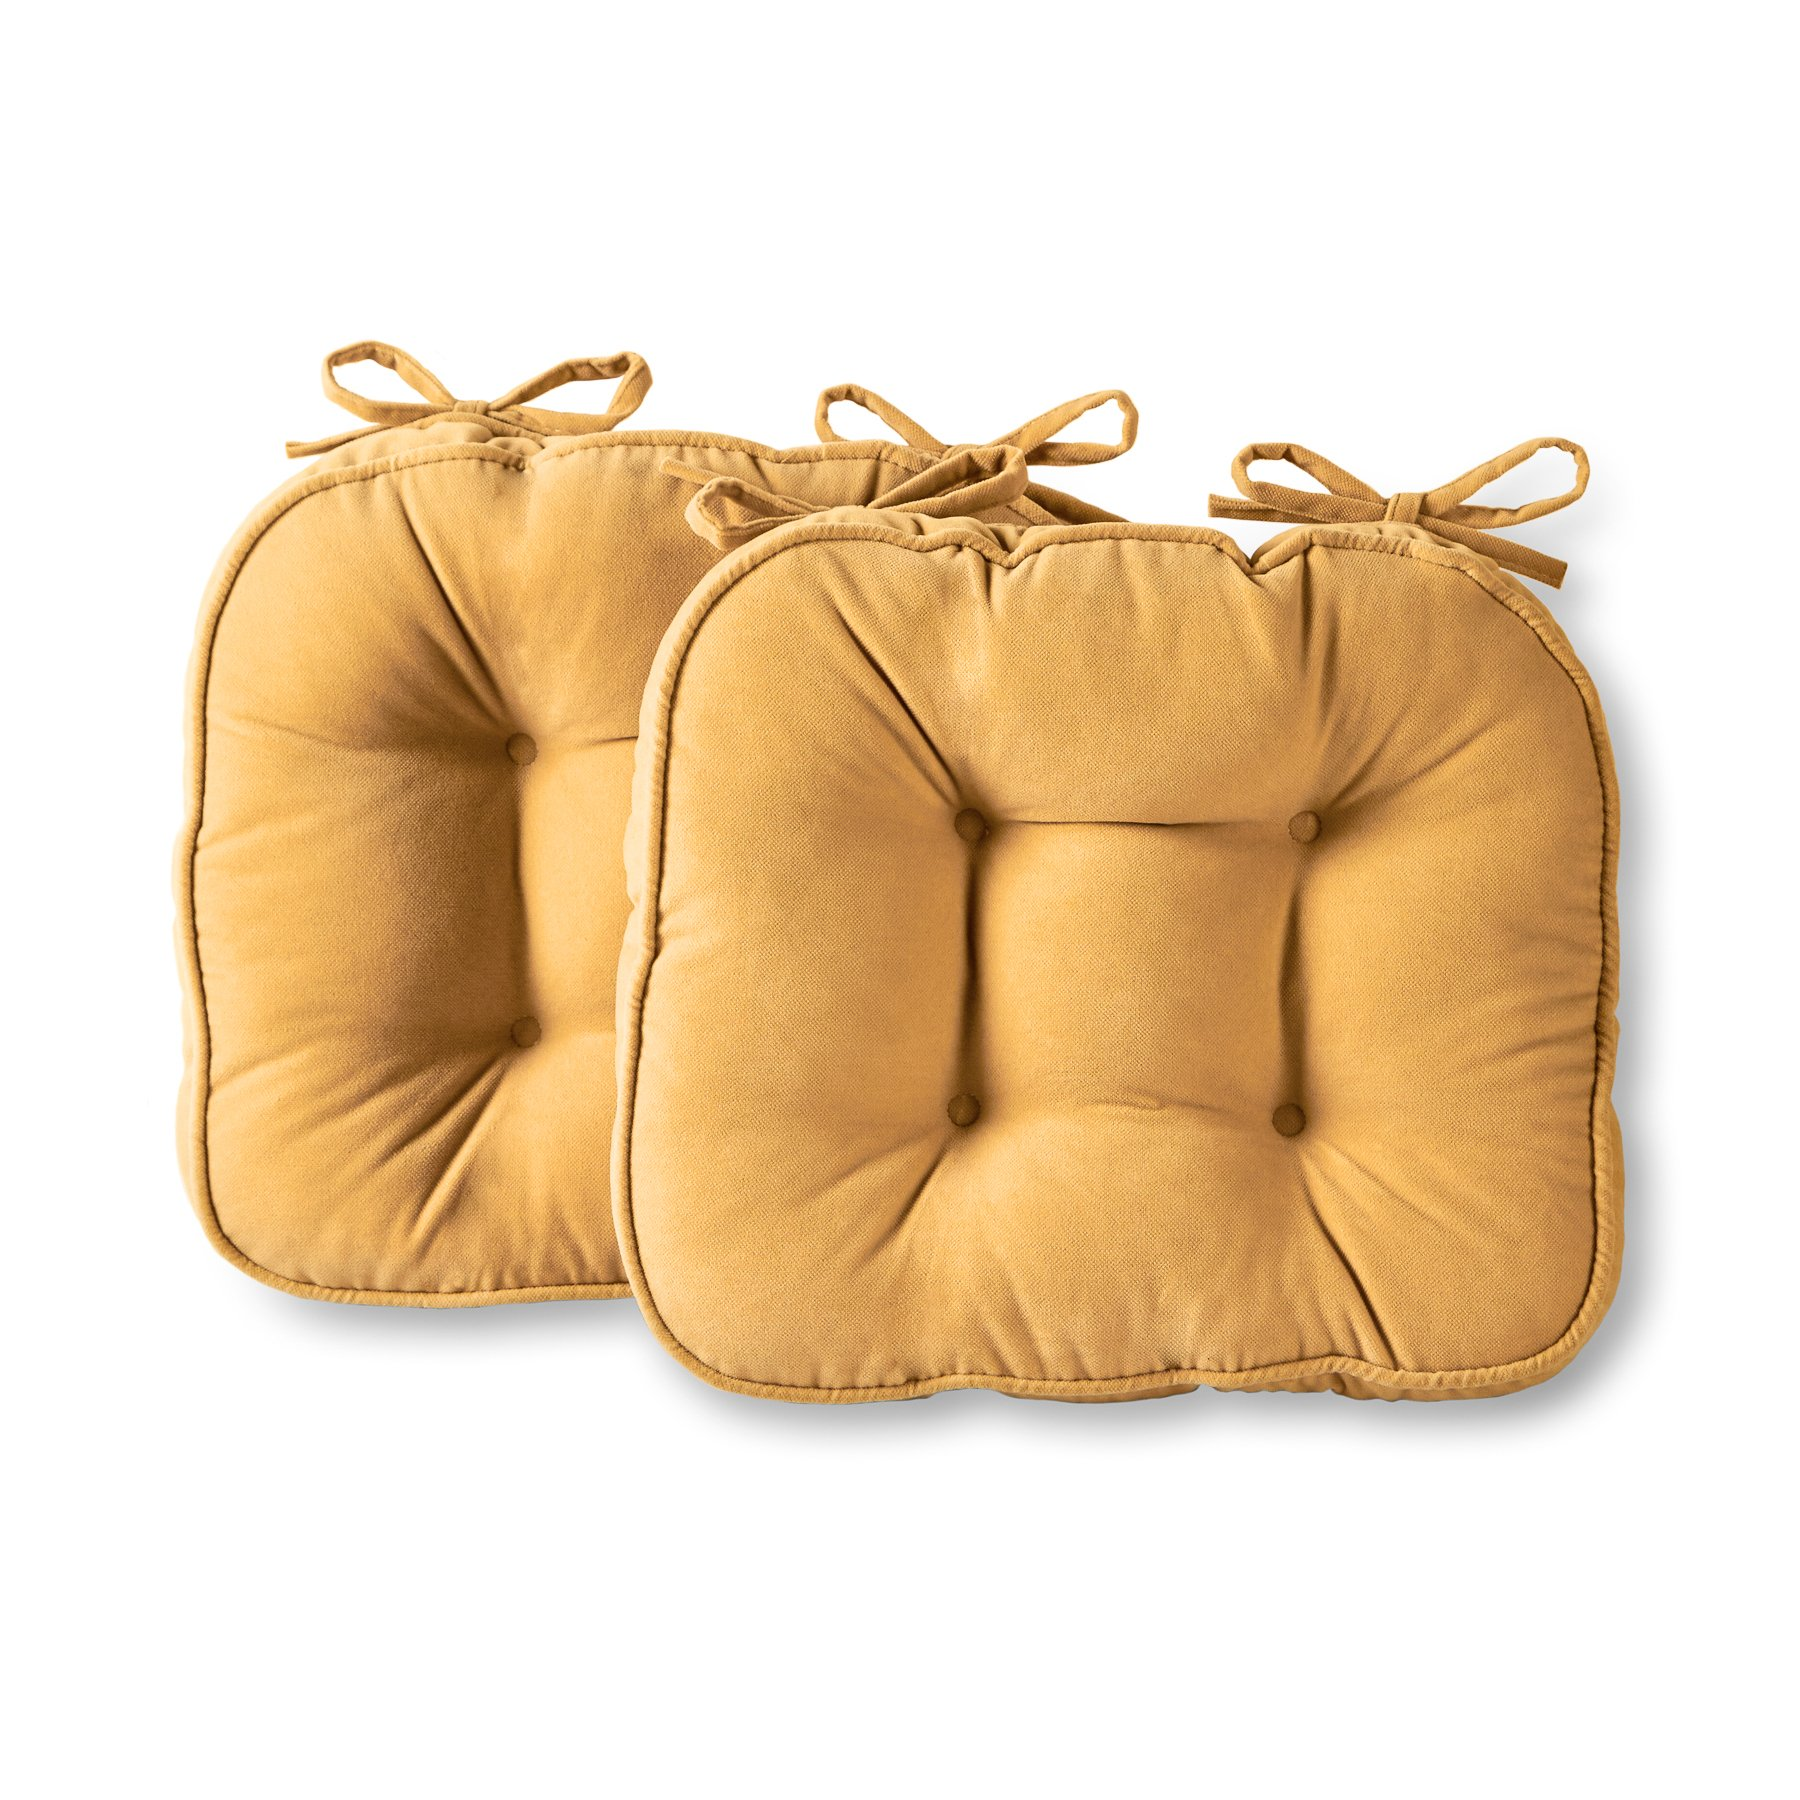 Greendale Home Fashions Hyatt Chair Pad, Cream, Set of 2